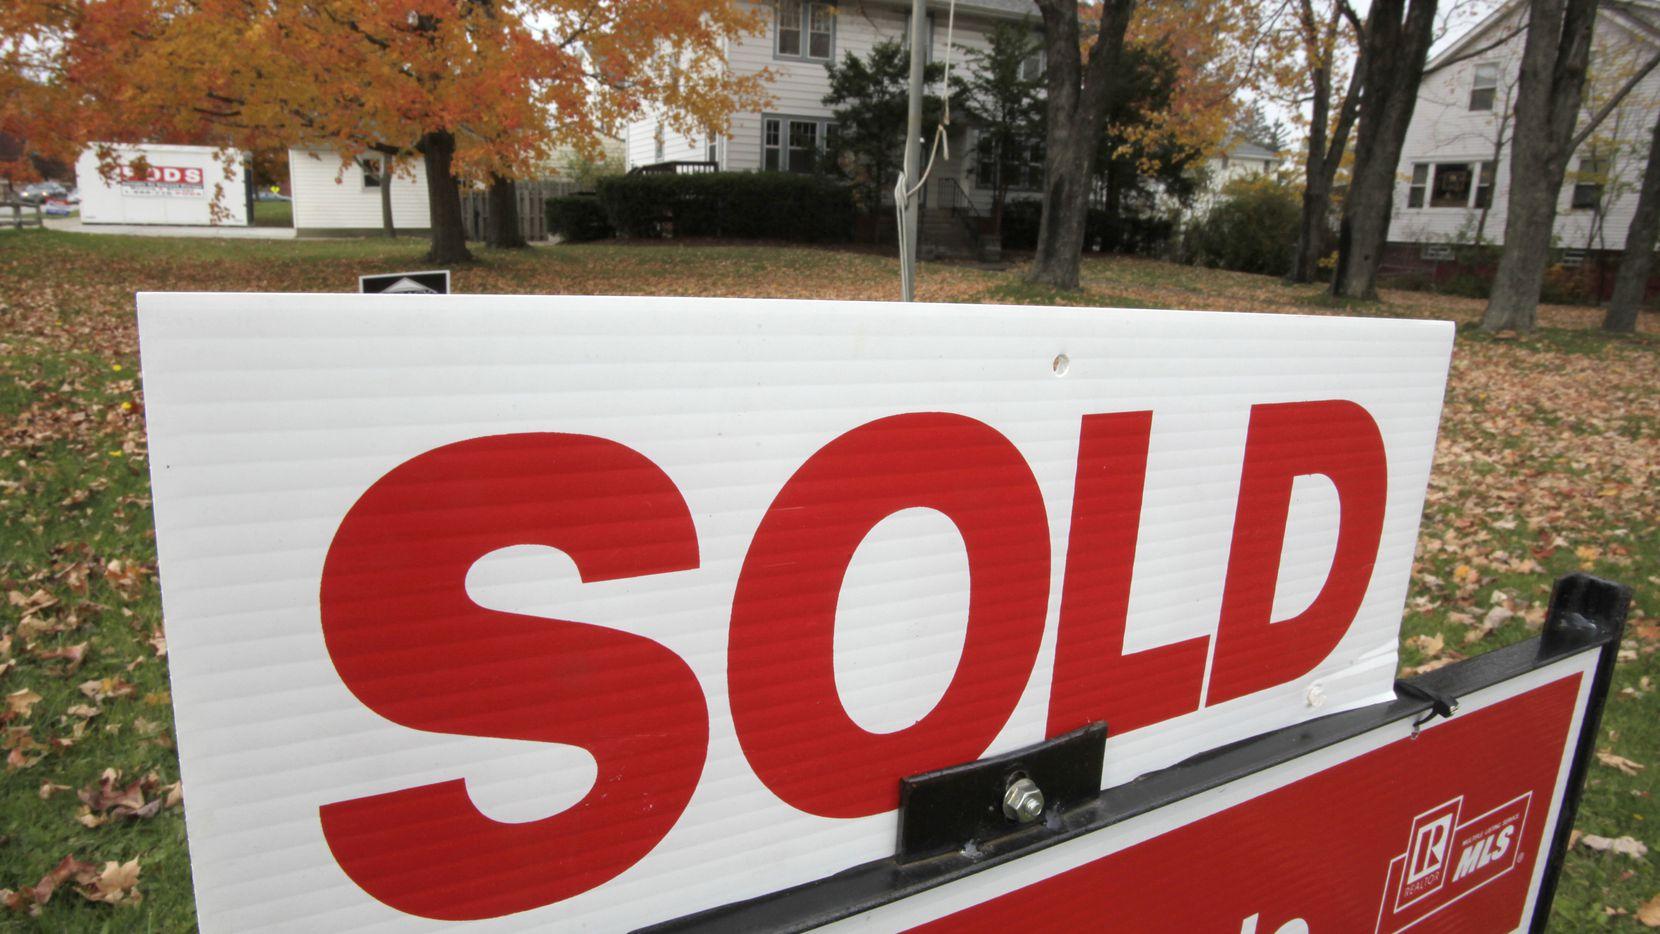 Realtor.com said Midland was the hottest U.S. home market in November.